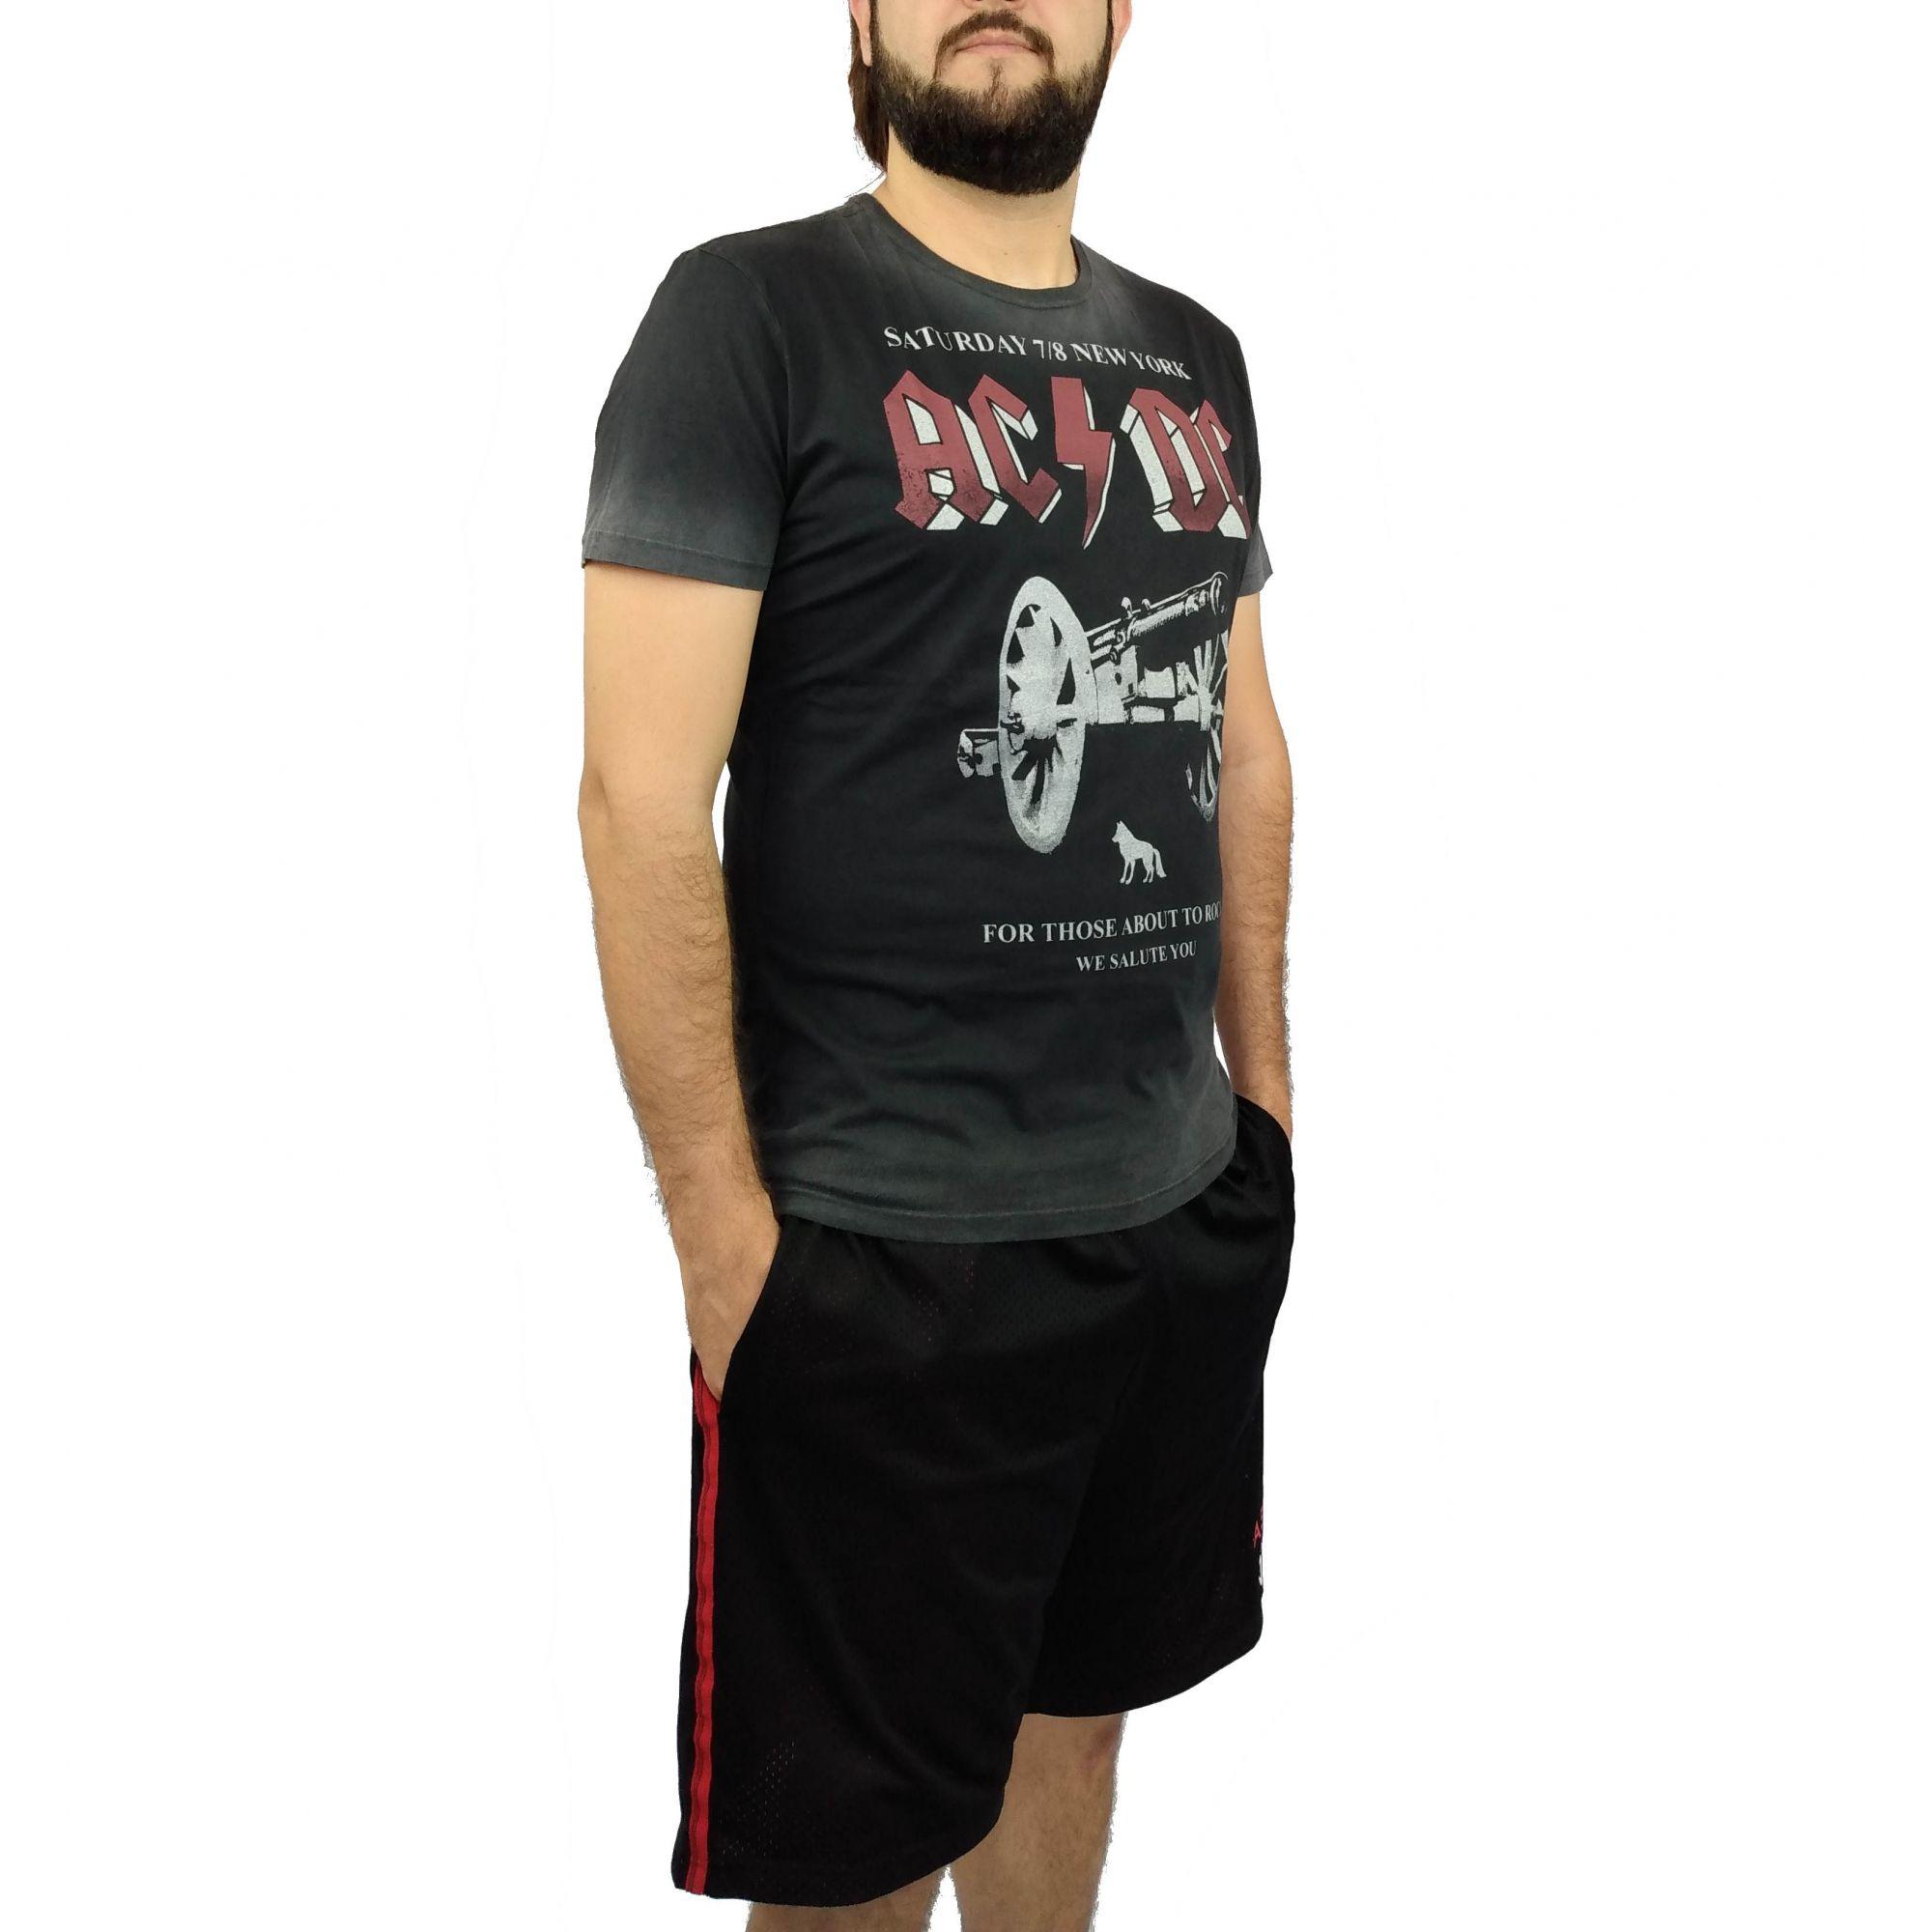 Camiseta Acostamento Masculina ACDC New York